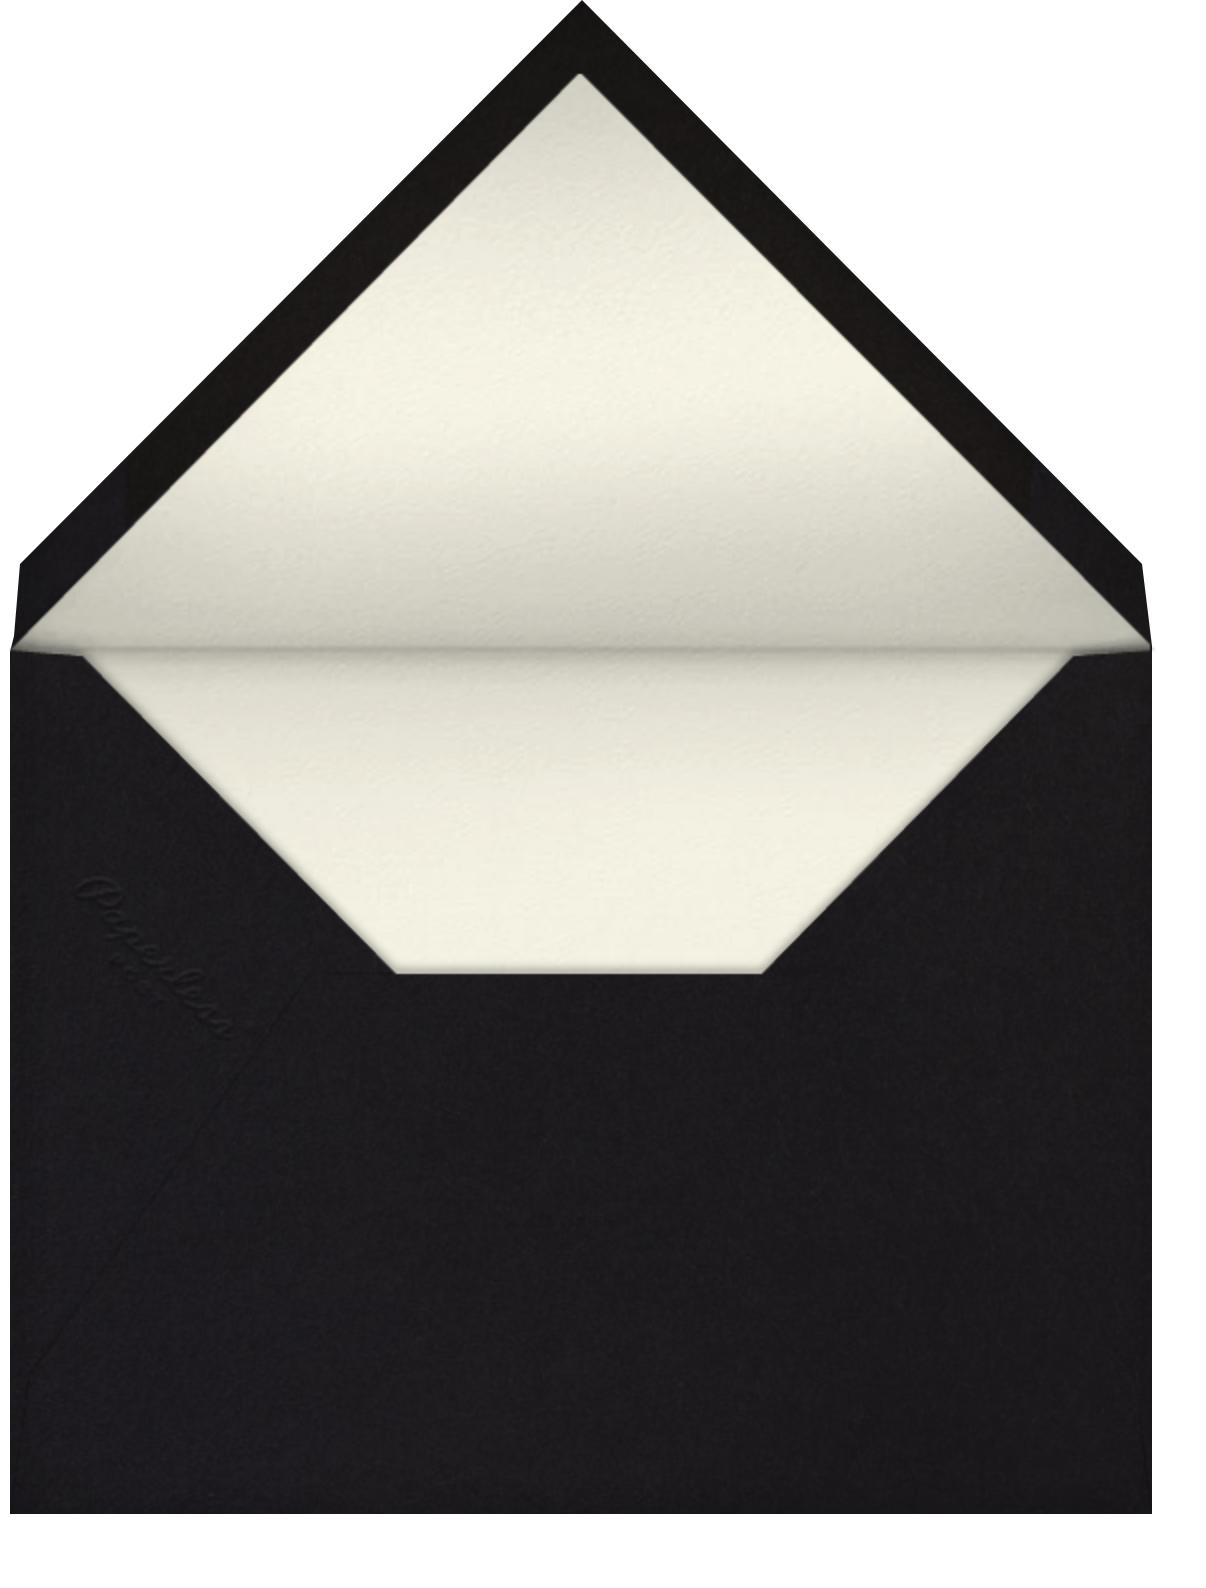 Ottoman Floral - Black - Oscar de la Renta - Envelope